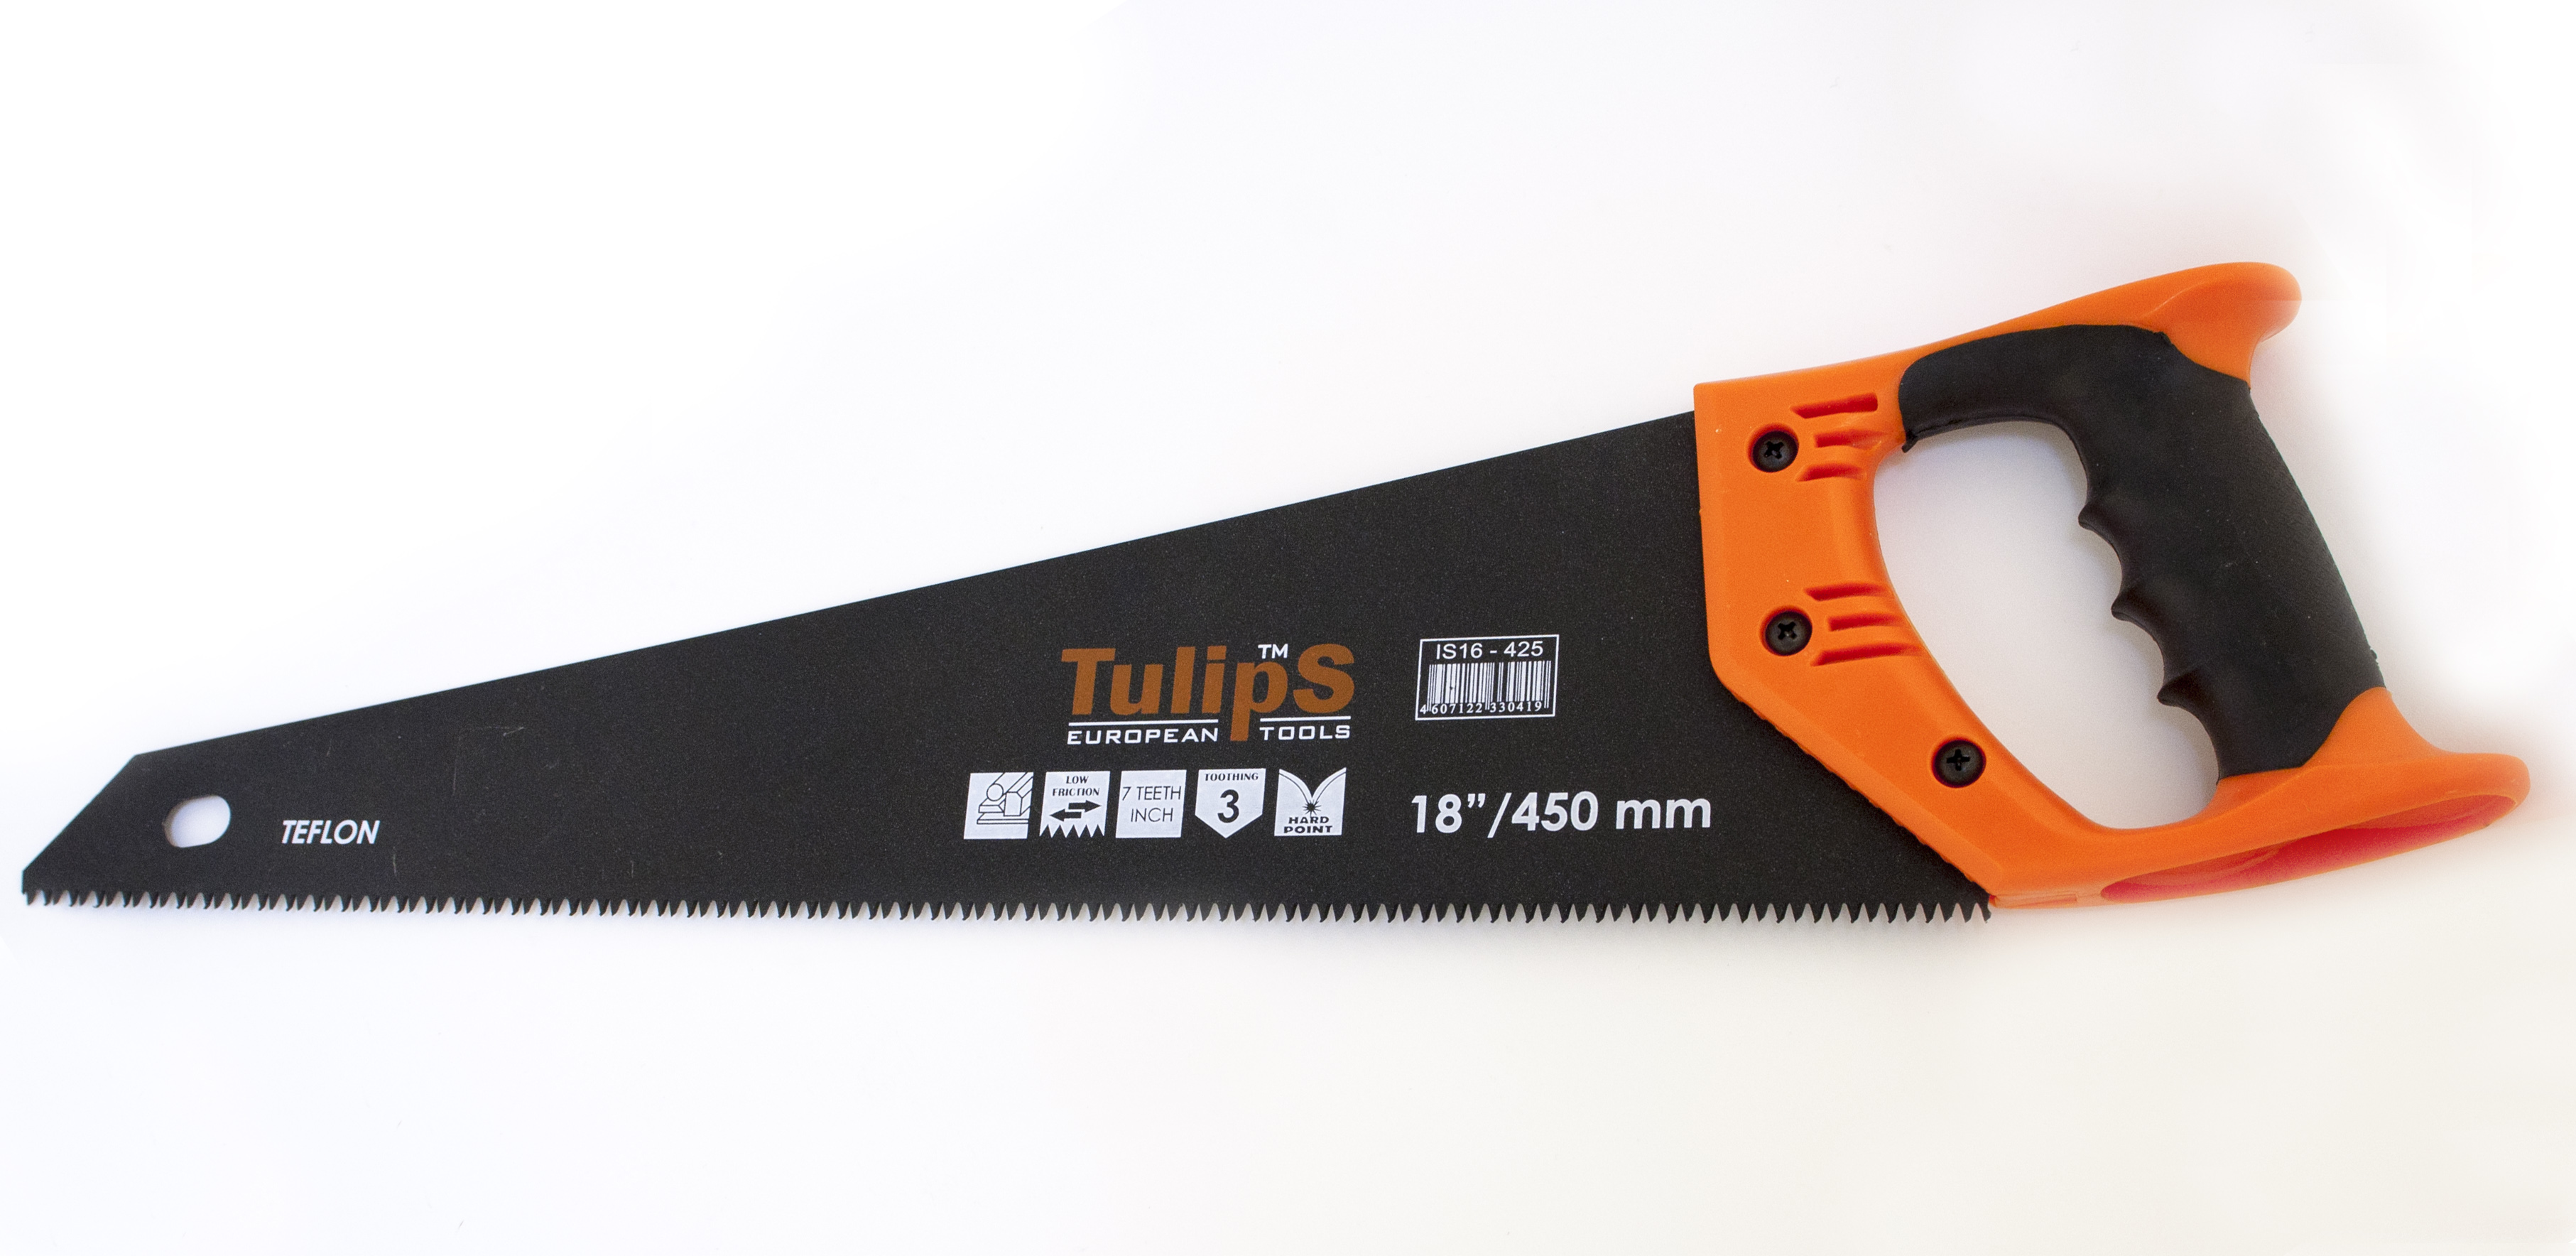 Ножовка по дереву Tulips toolsНожовки ручные<br>Длина (мм): 450,<br>Назначение: дерево,<br>Тип ножовки: ножовка<br>